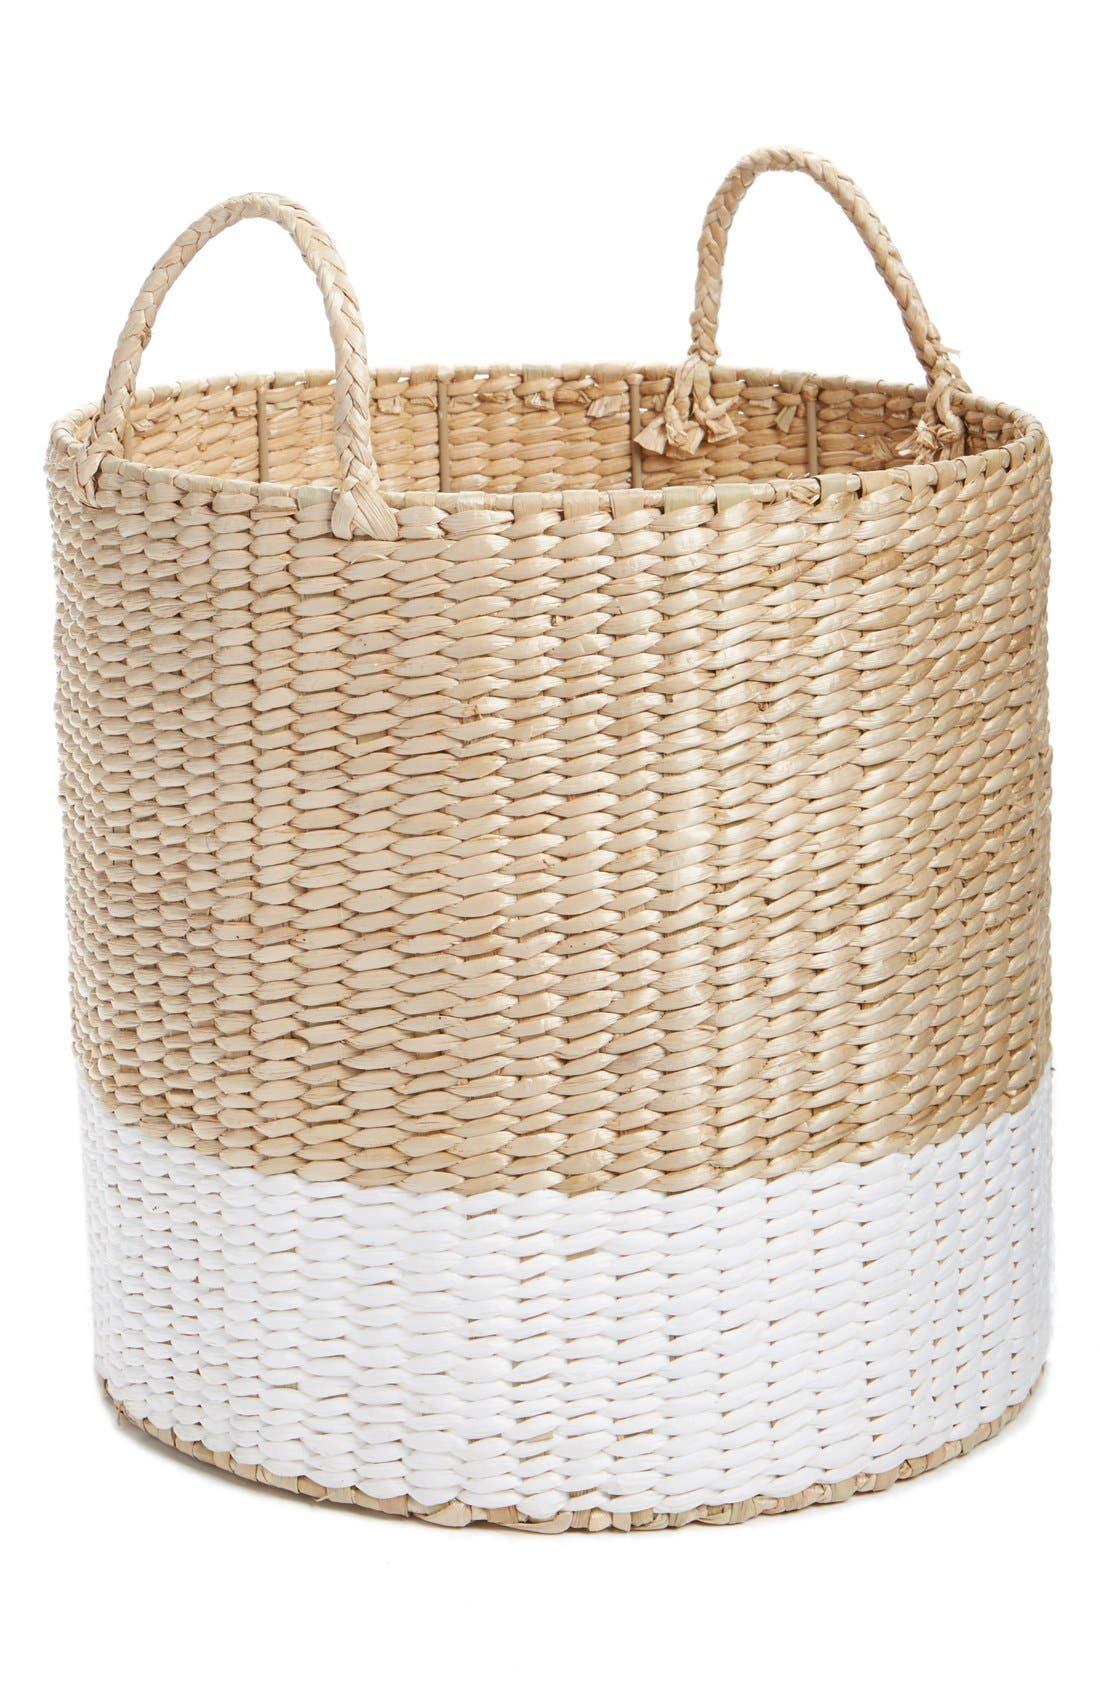 Alternate Image 1 Selected - Levtex Straw Basket